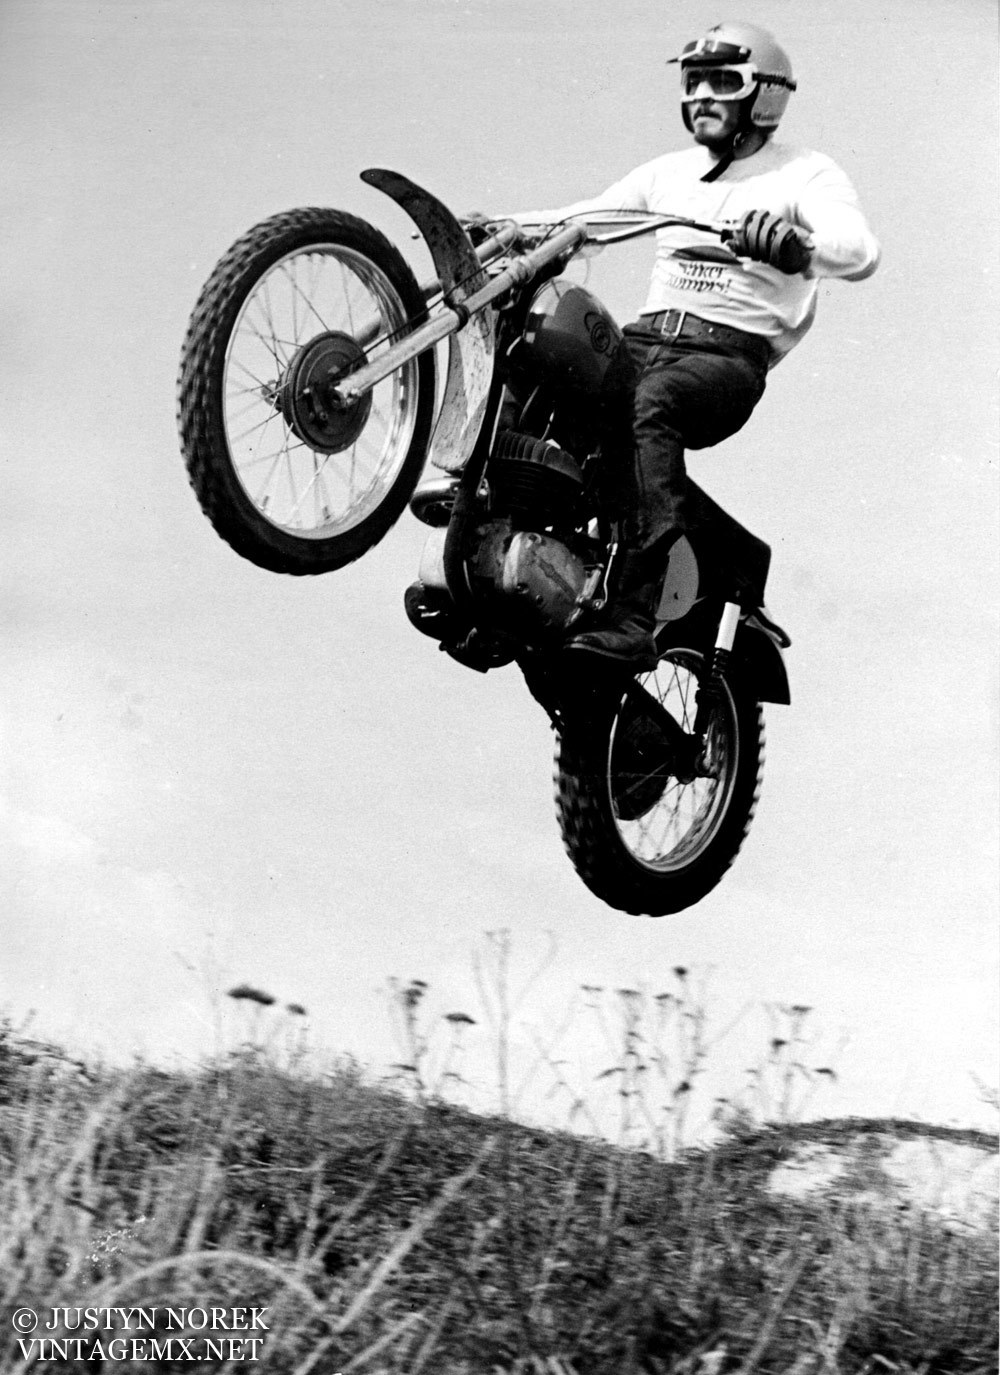 vintage-GP-1960s-20.jpg#asset:37250